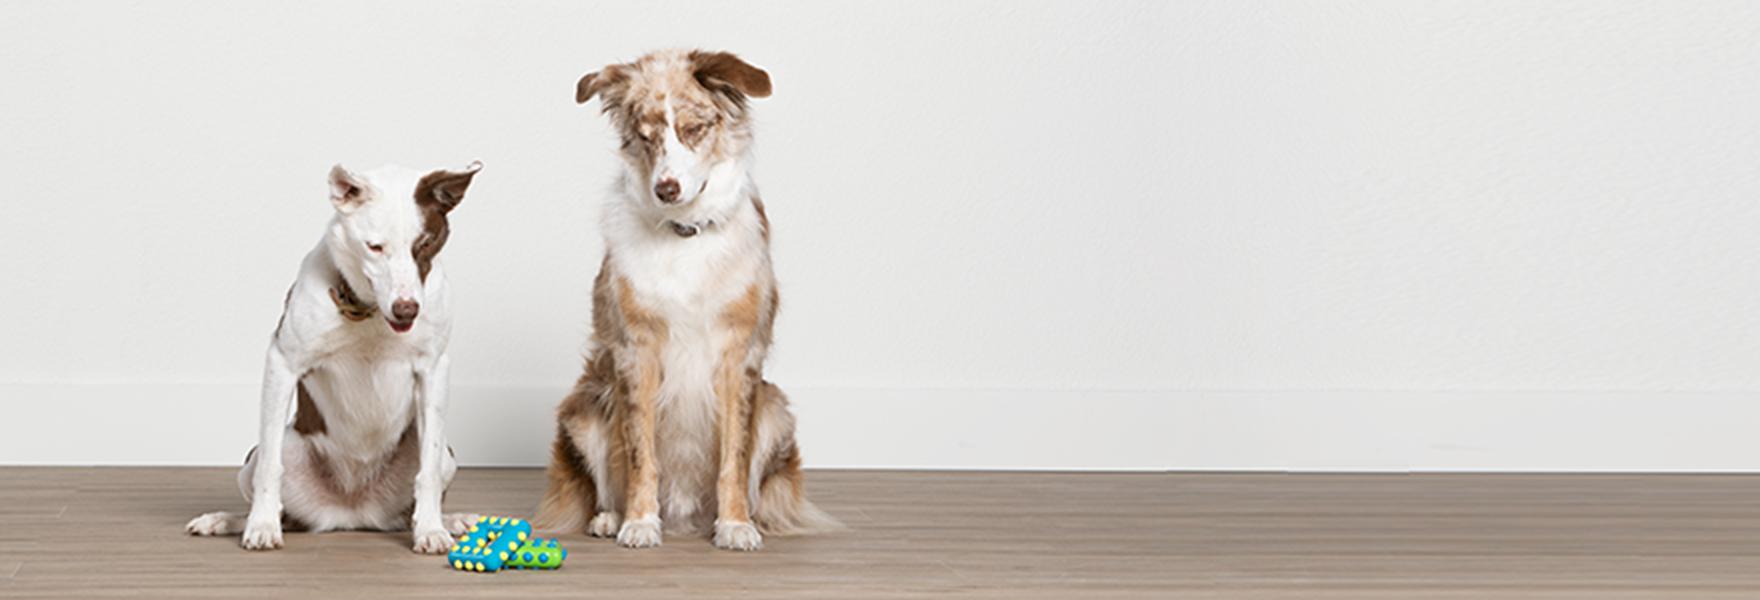 Dog Training: Puppy and Adult Dog Training Classes | PetSmart